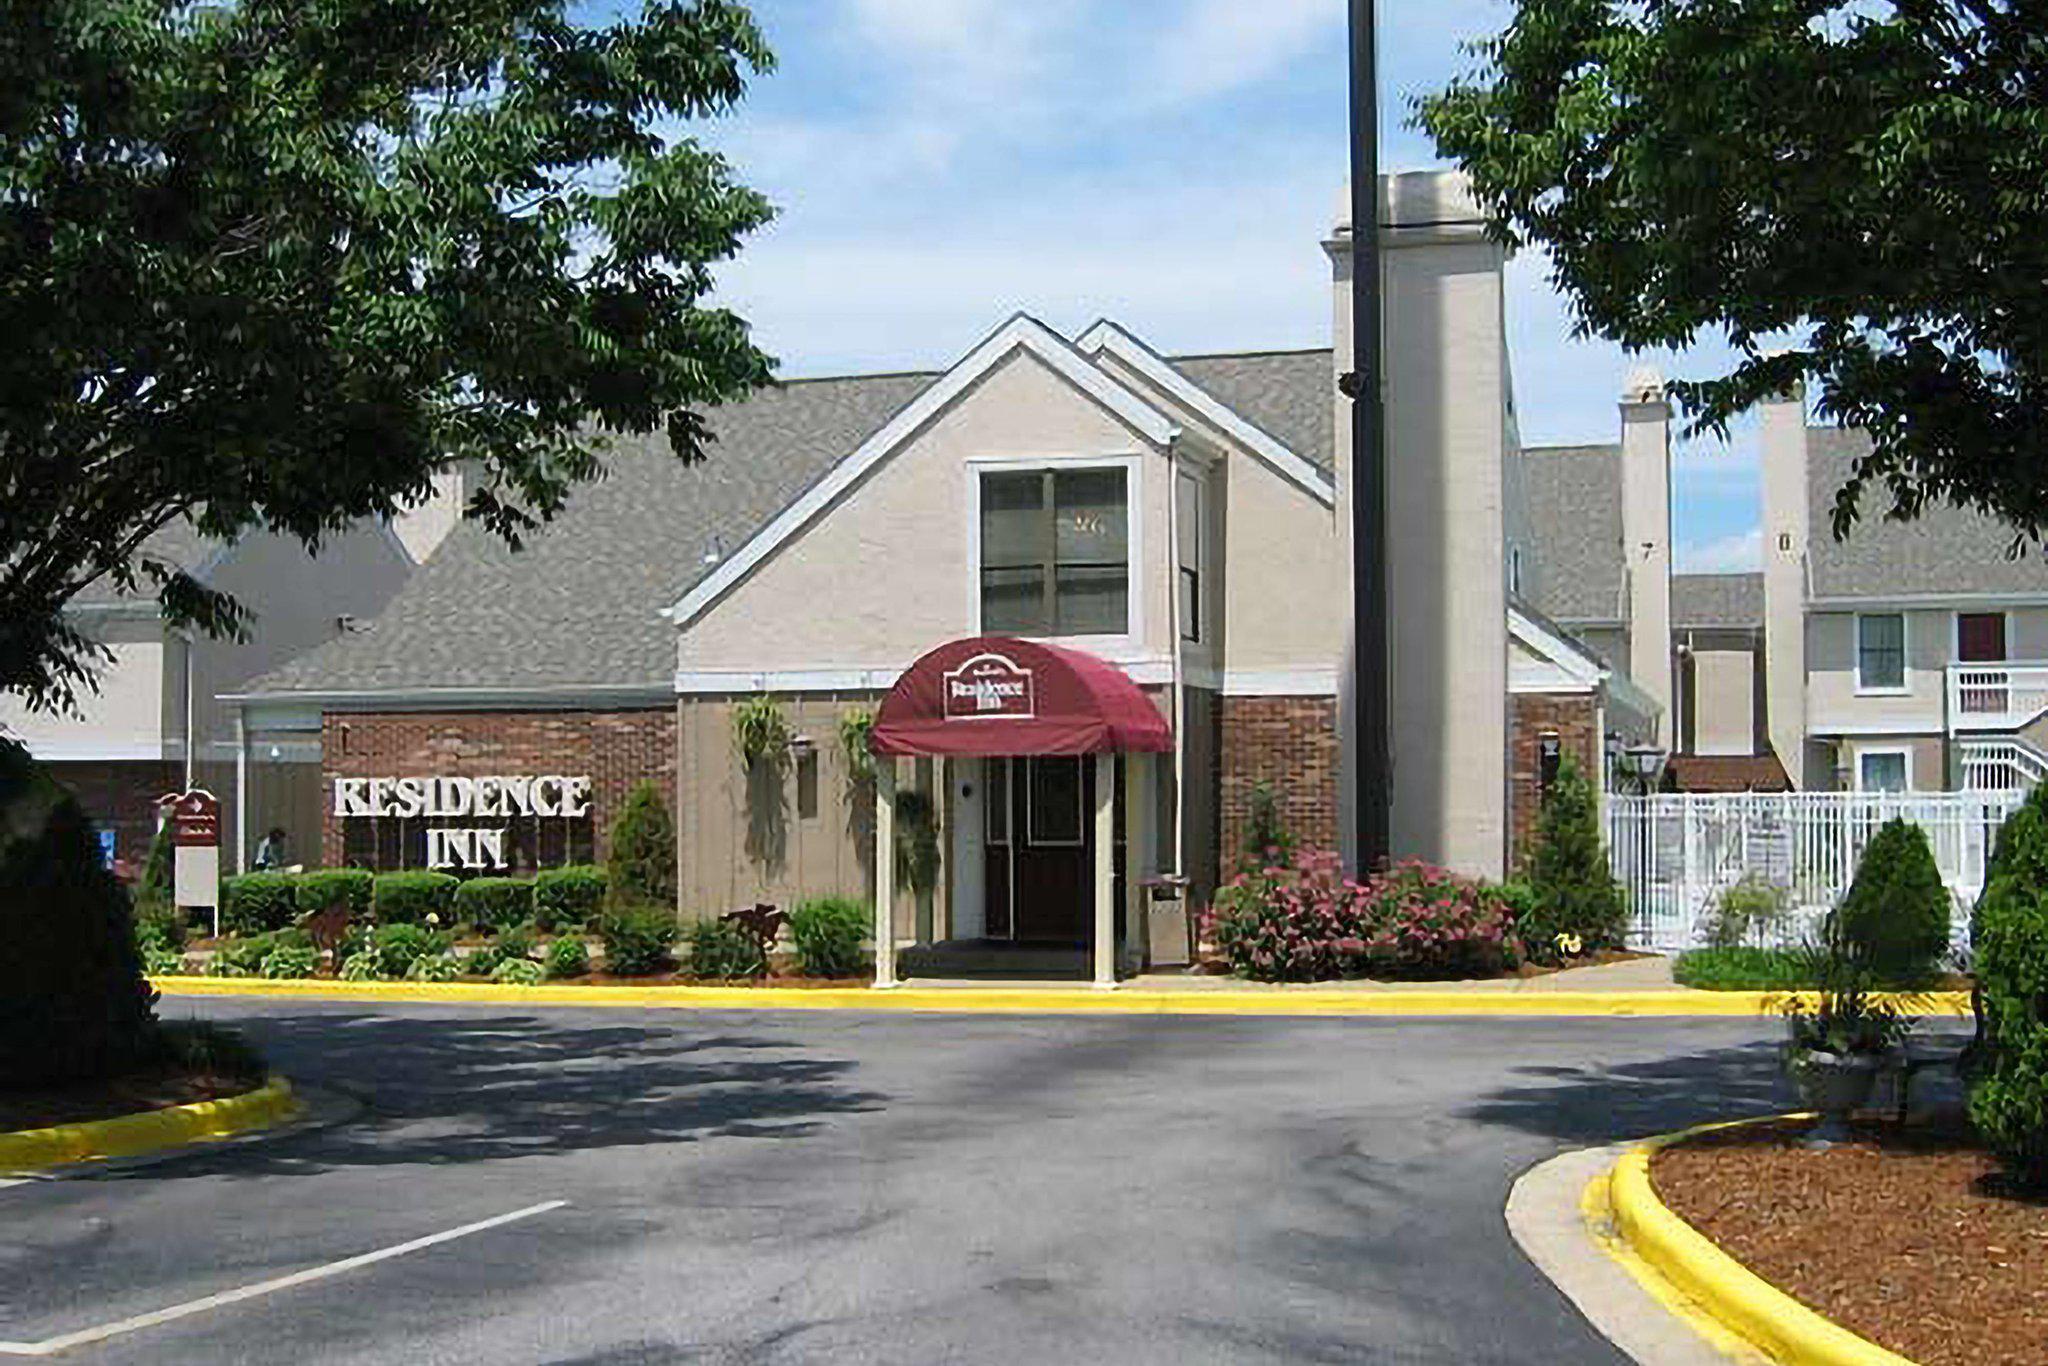 Residence Inn by Marriott Louisville East